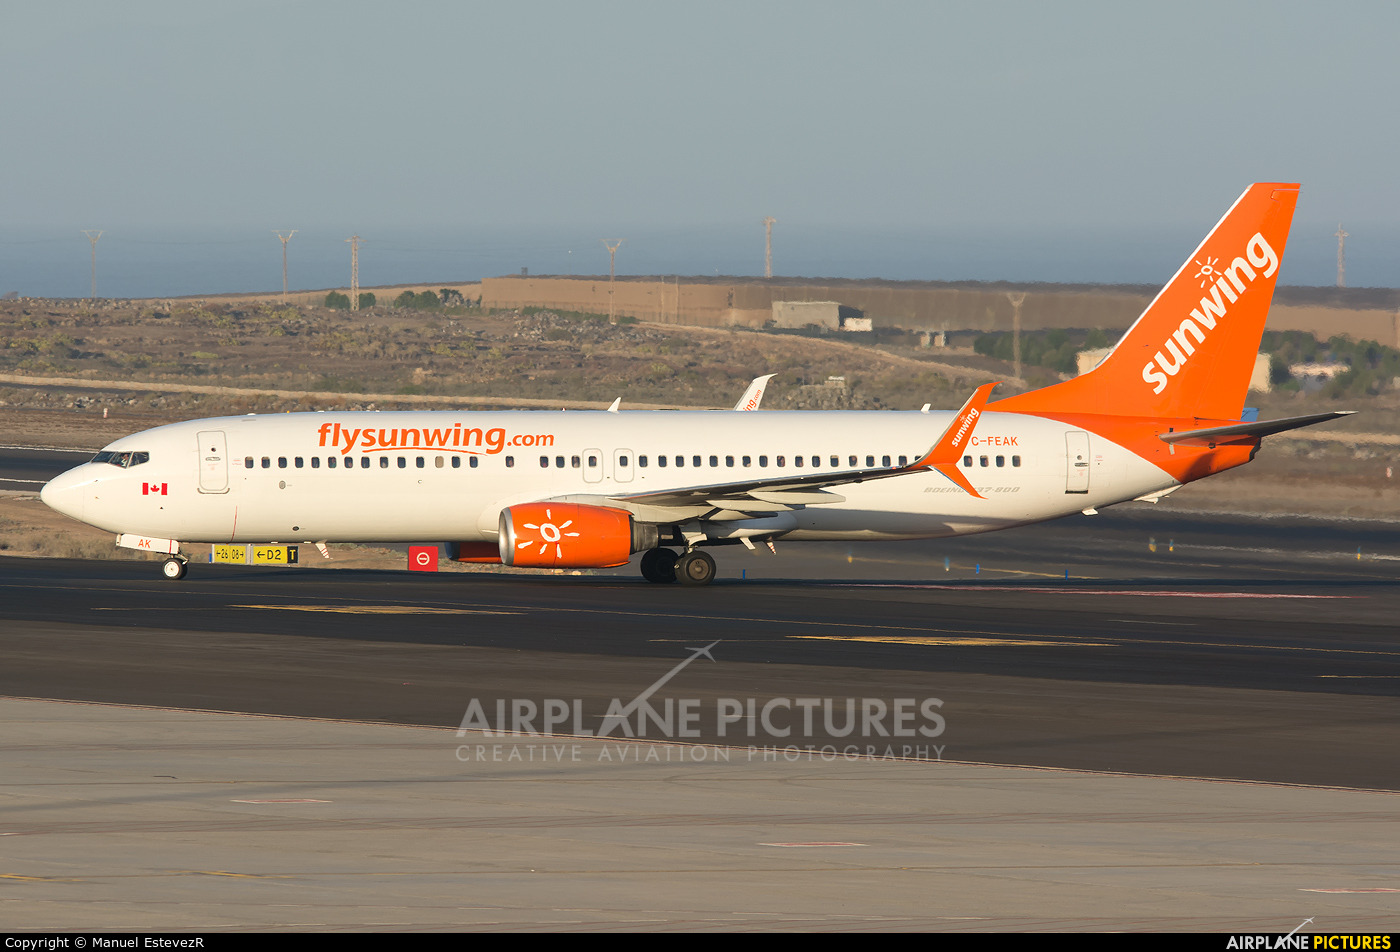 Sunwing Airlines C-FEAK aircraft at Tenerife Sur - Reina Sofia